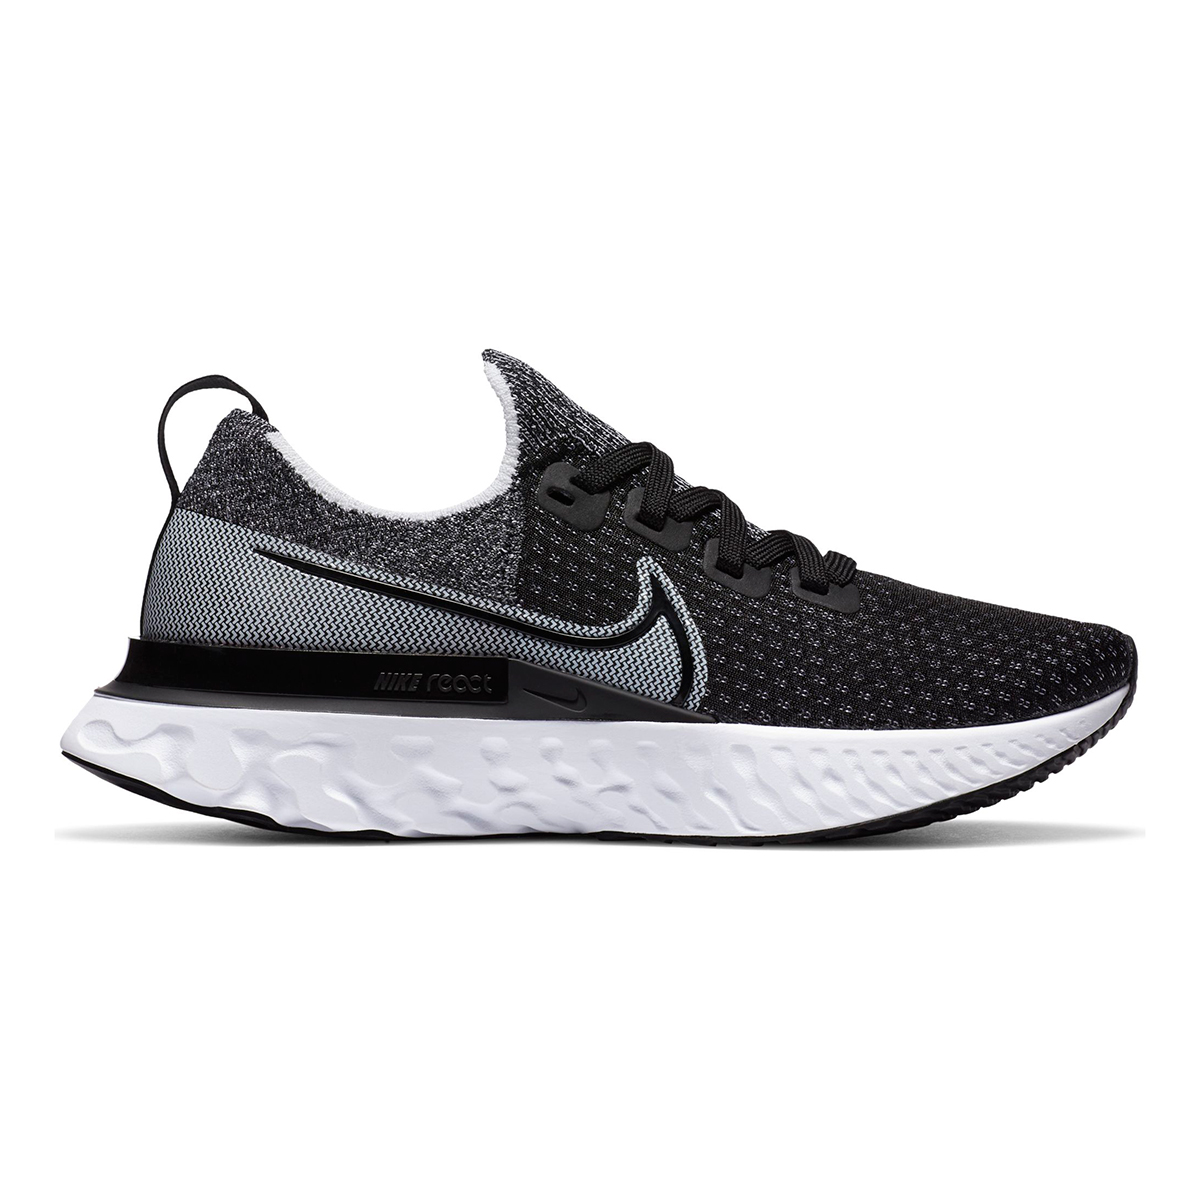 Women's Nike React Infinity Run Flyknit Running Shoe - Color: Black/White/White - Size: 5 - Width: Regular, Black/White/White, large, image 1